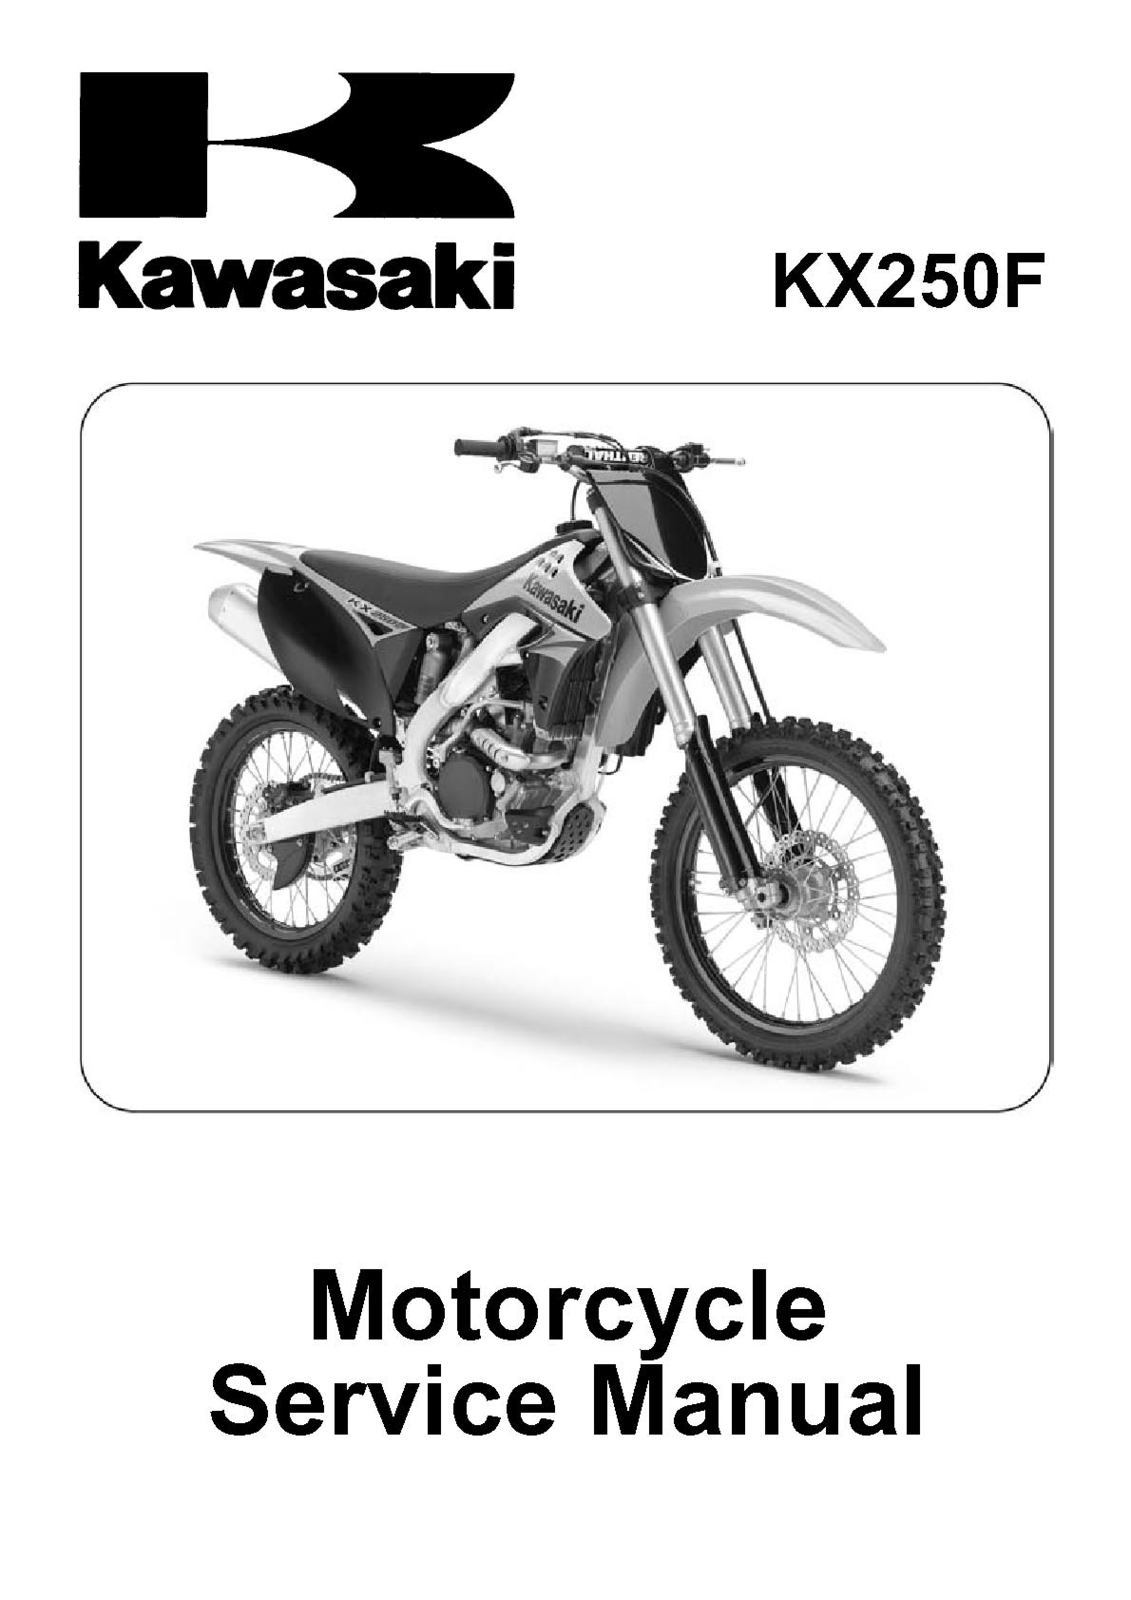 Kx250w9f 2009 kx250f